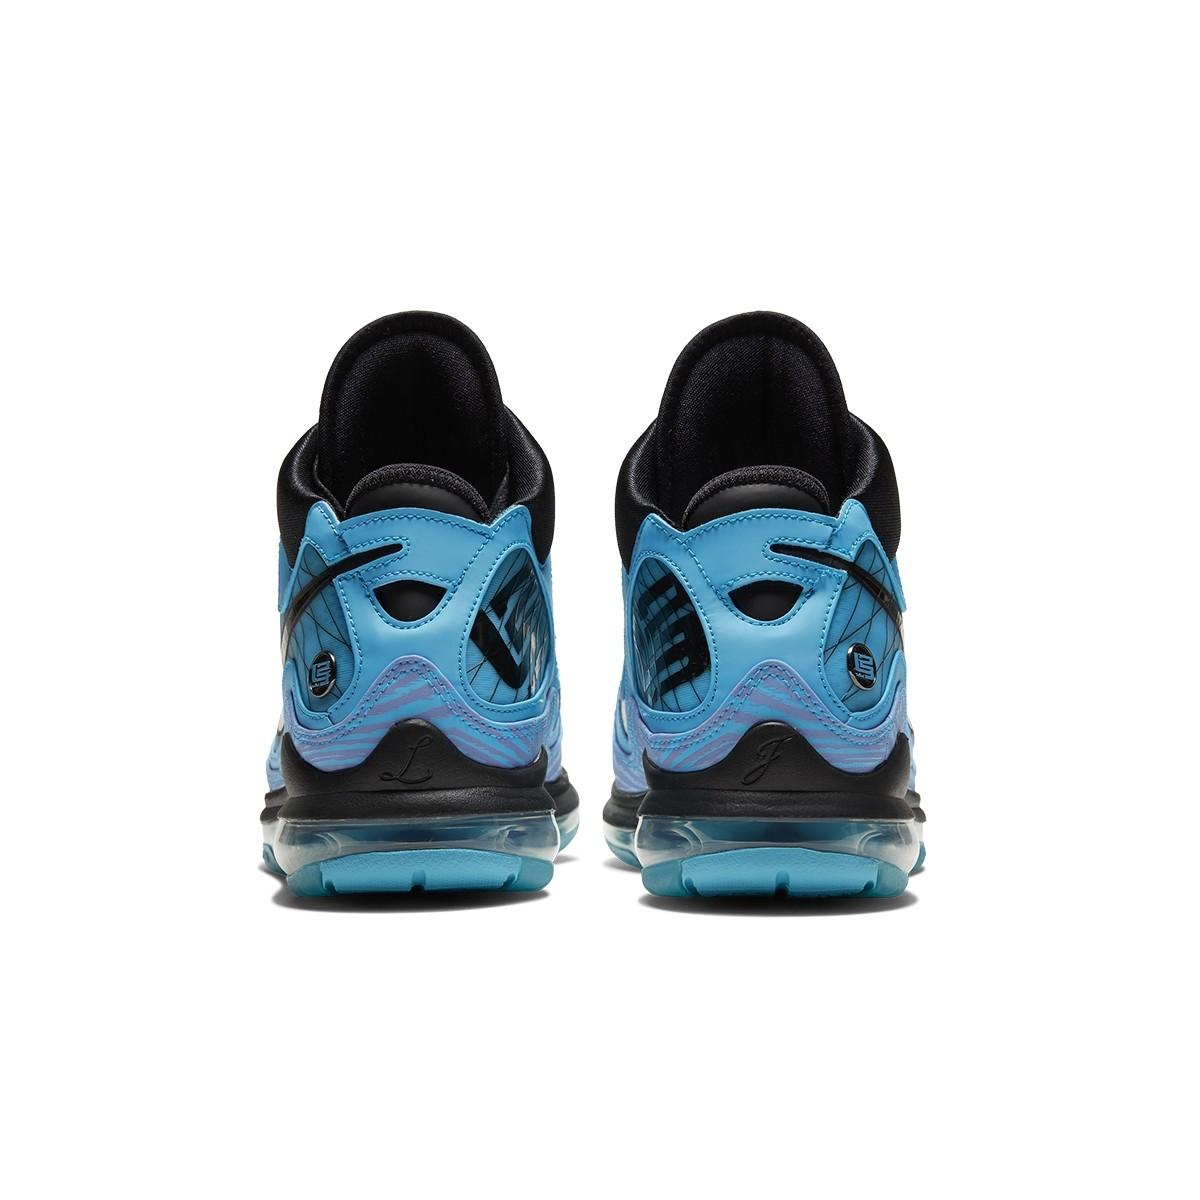 Nike Lebron 7 QS Jr 'All Star' CU5646-400